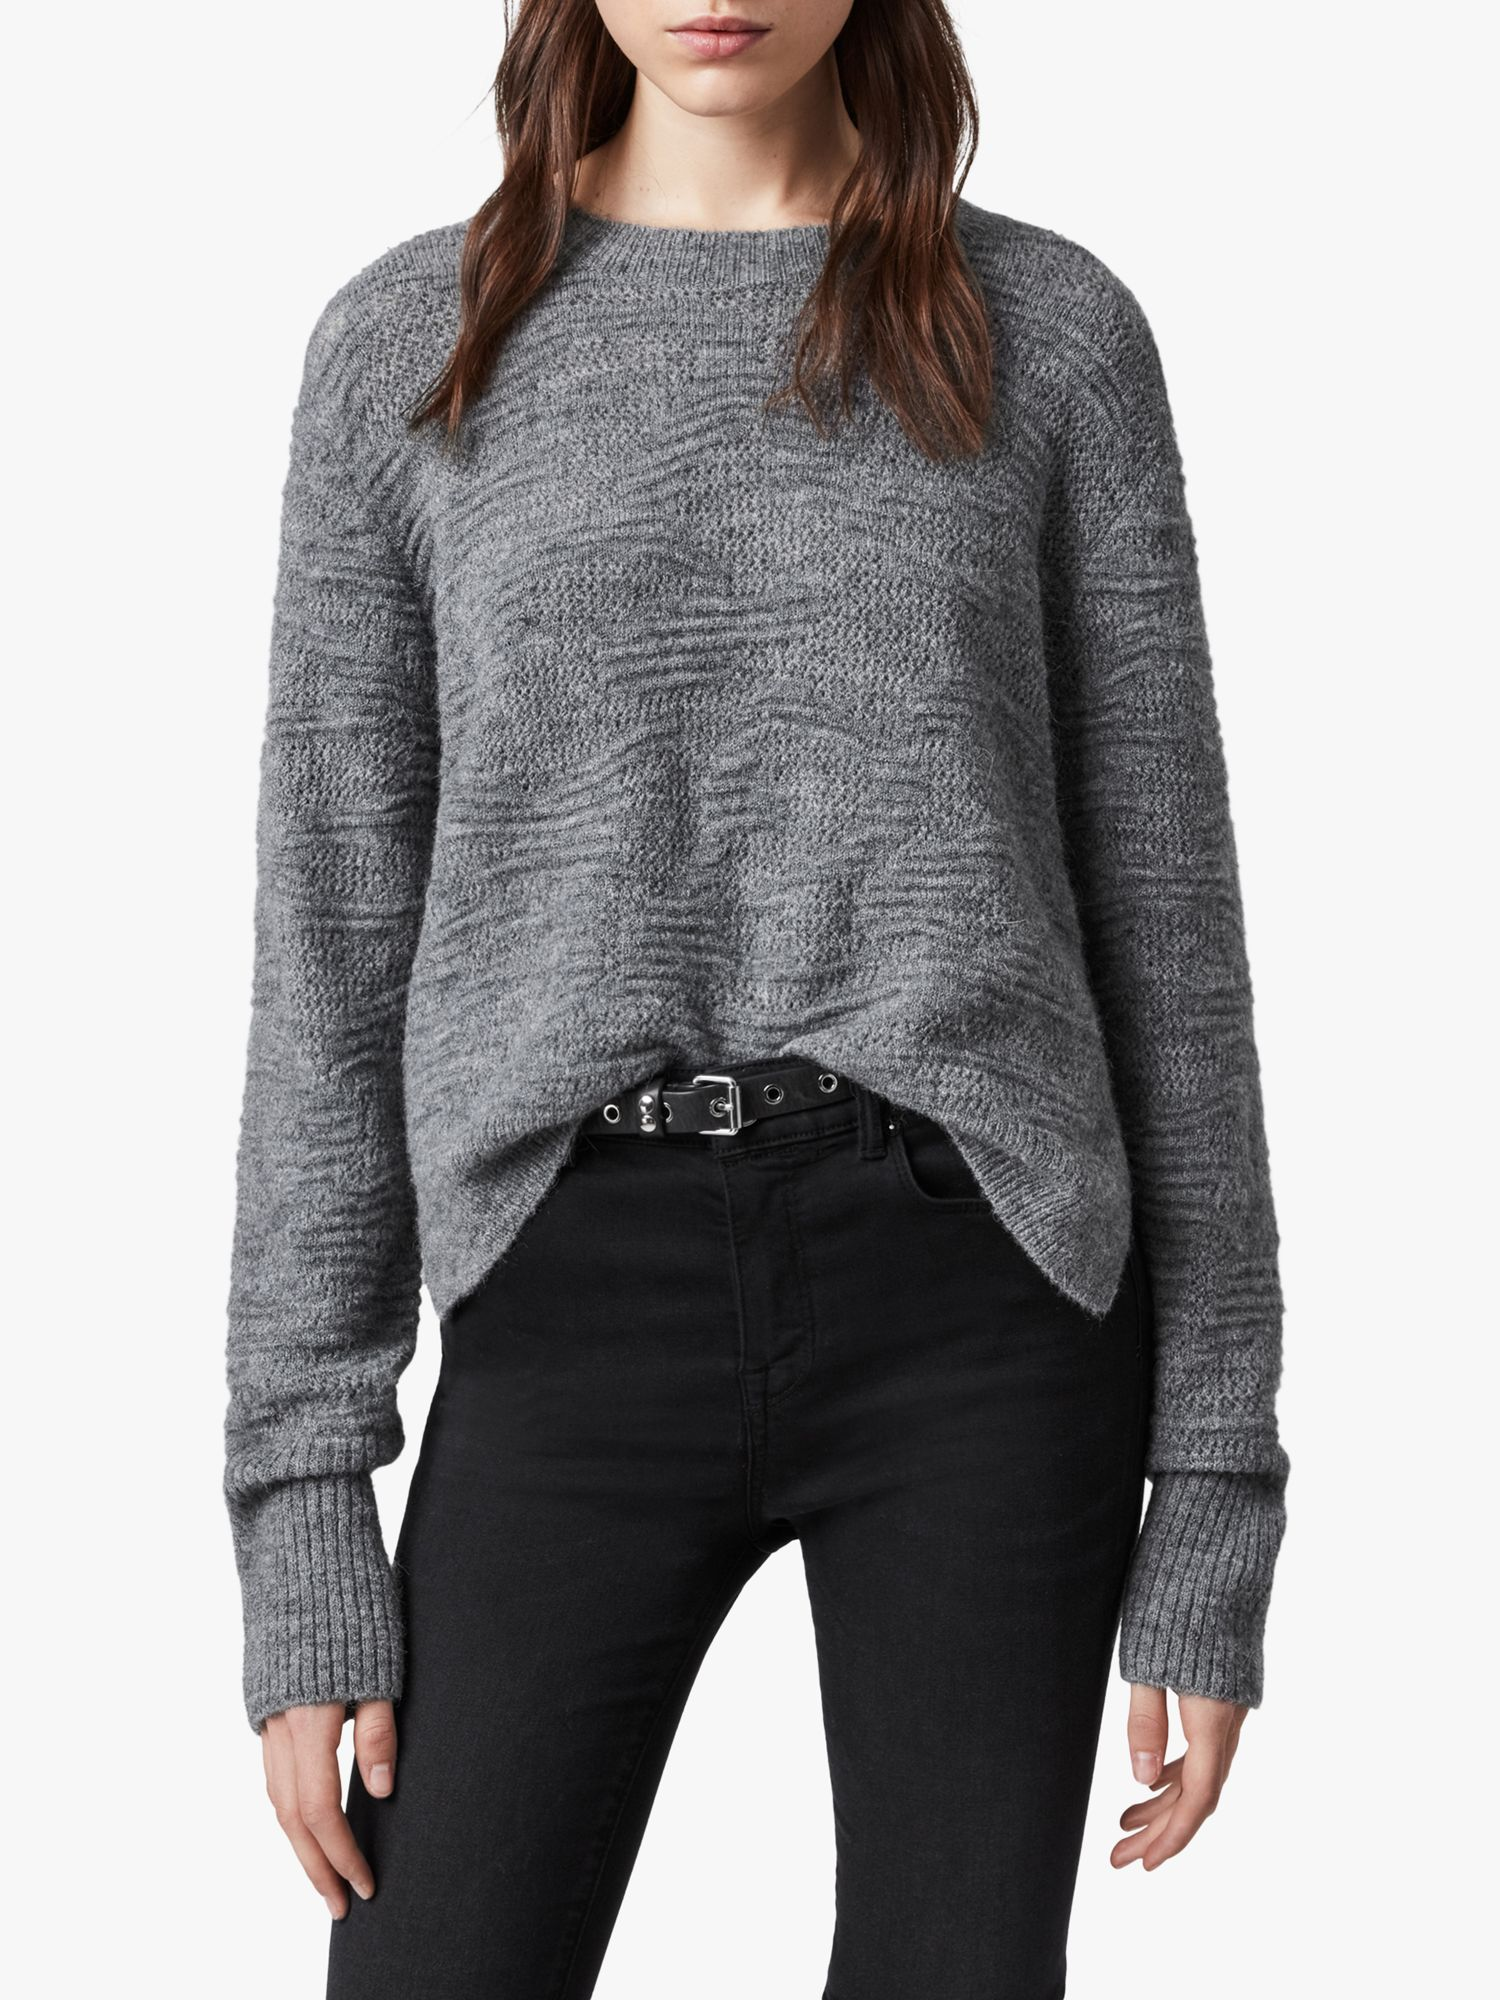 AllSaints AllSaints Tabby Wool Alpaca Jumper, Grey Marl